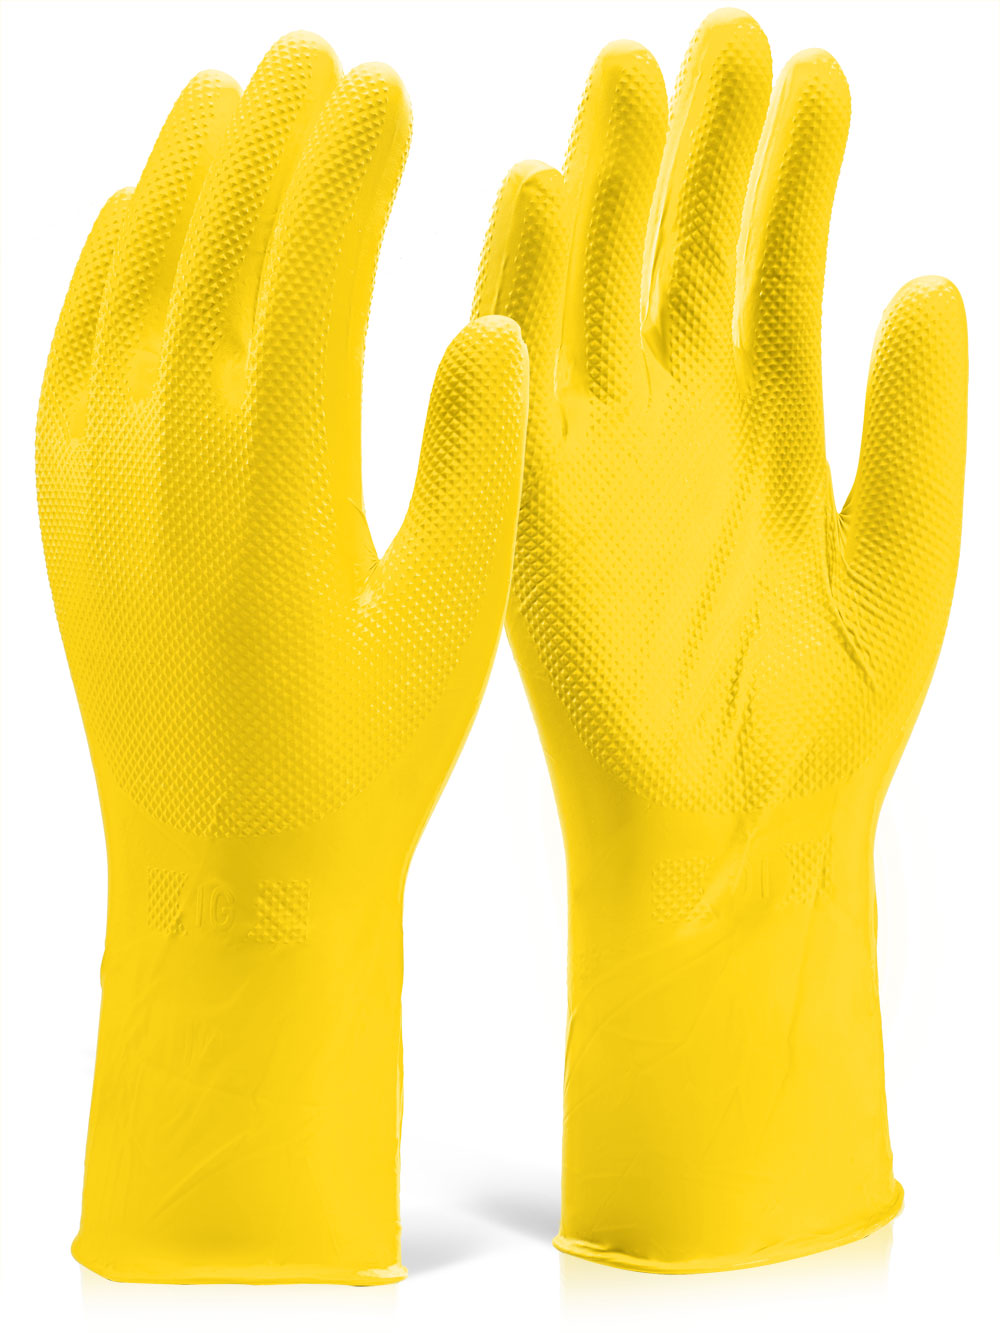 Nitrile Disposable Diamond Grip Glove 30cm Yellow